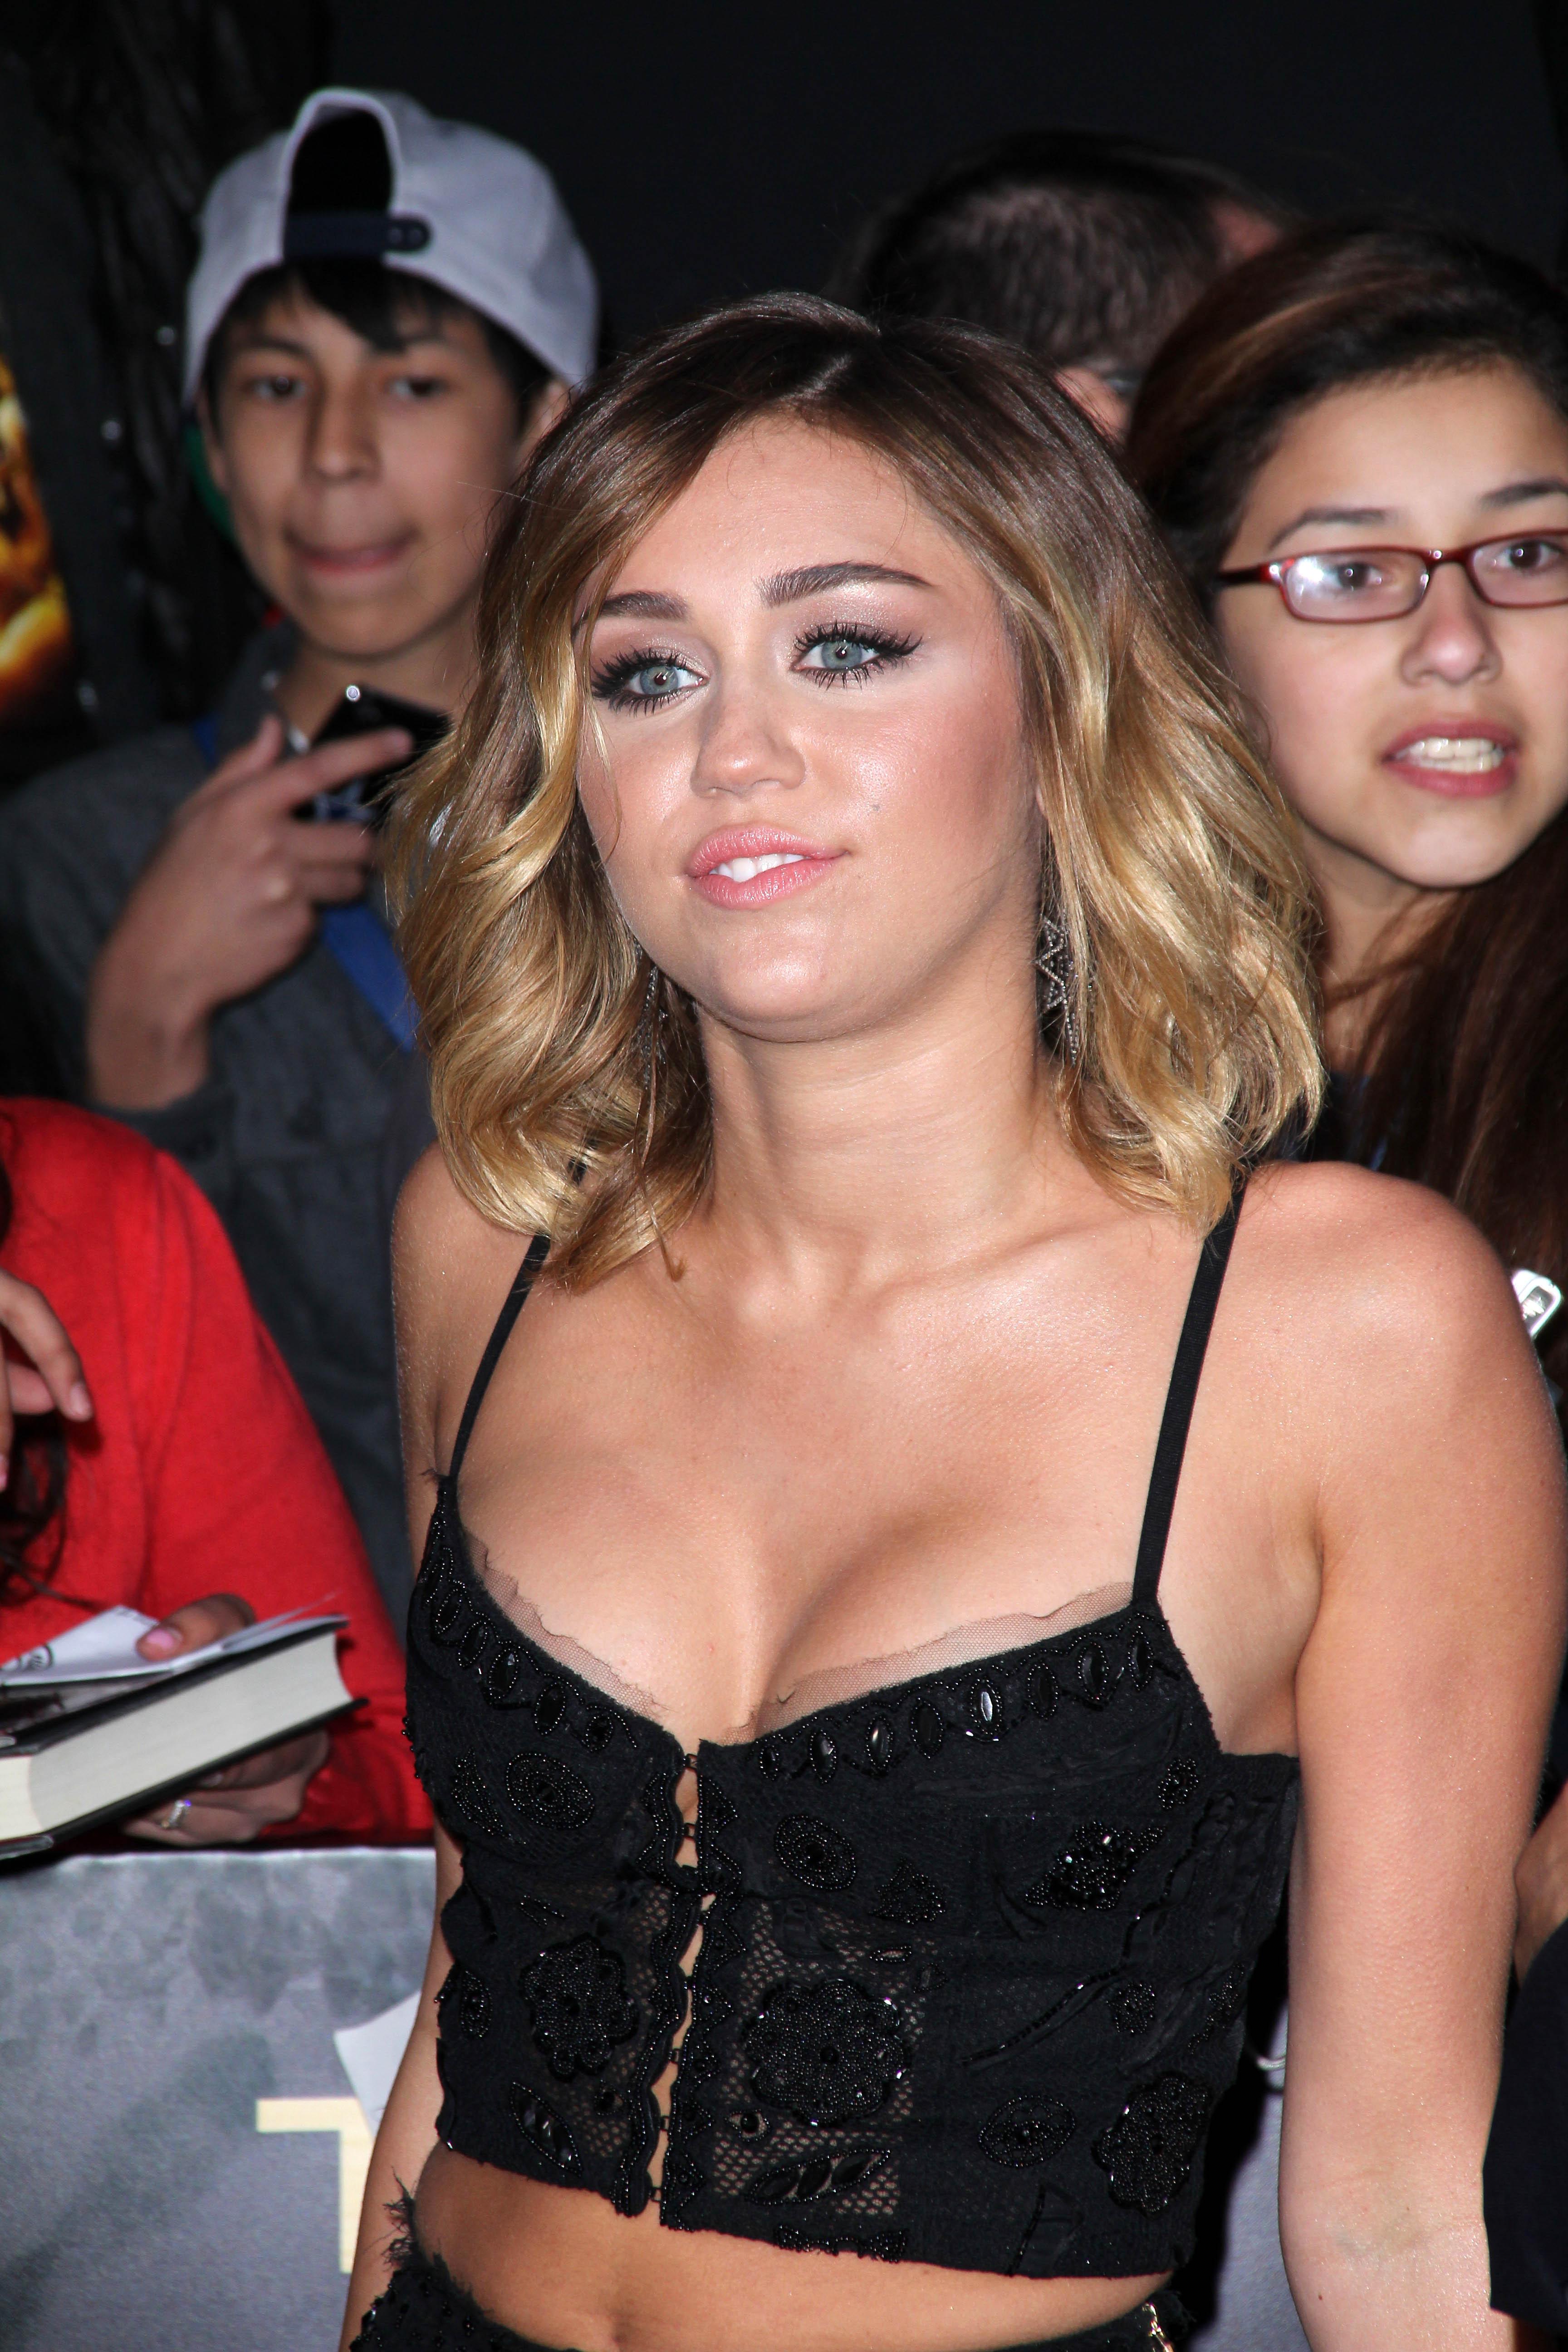 33055_Miley_Cyrus_Adds32_123_86lo.jpg